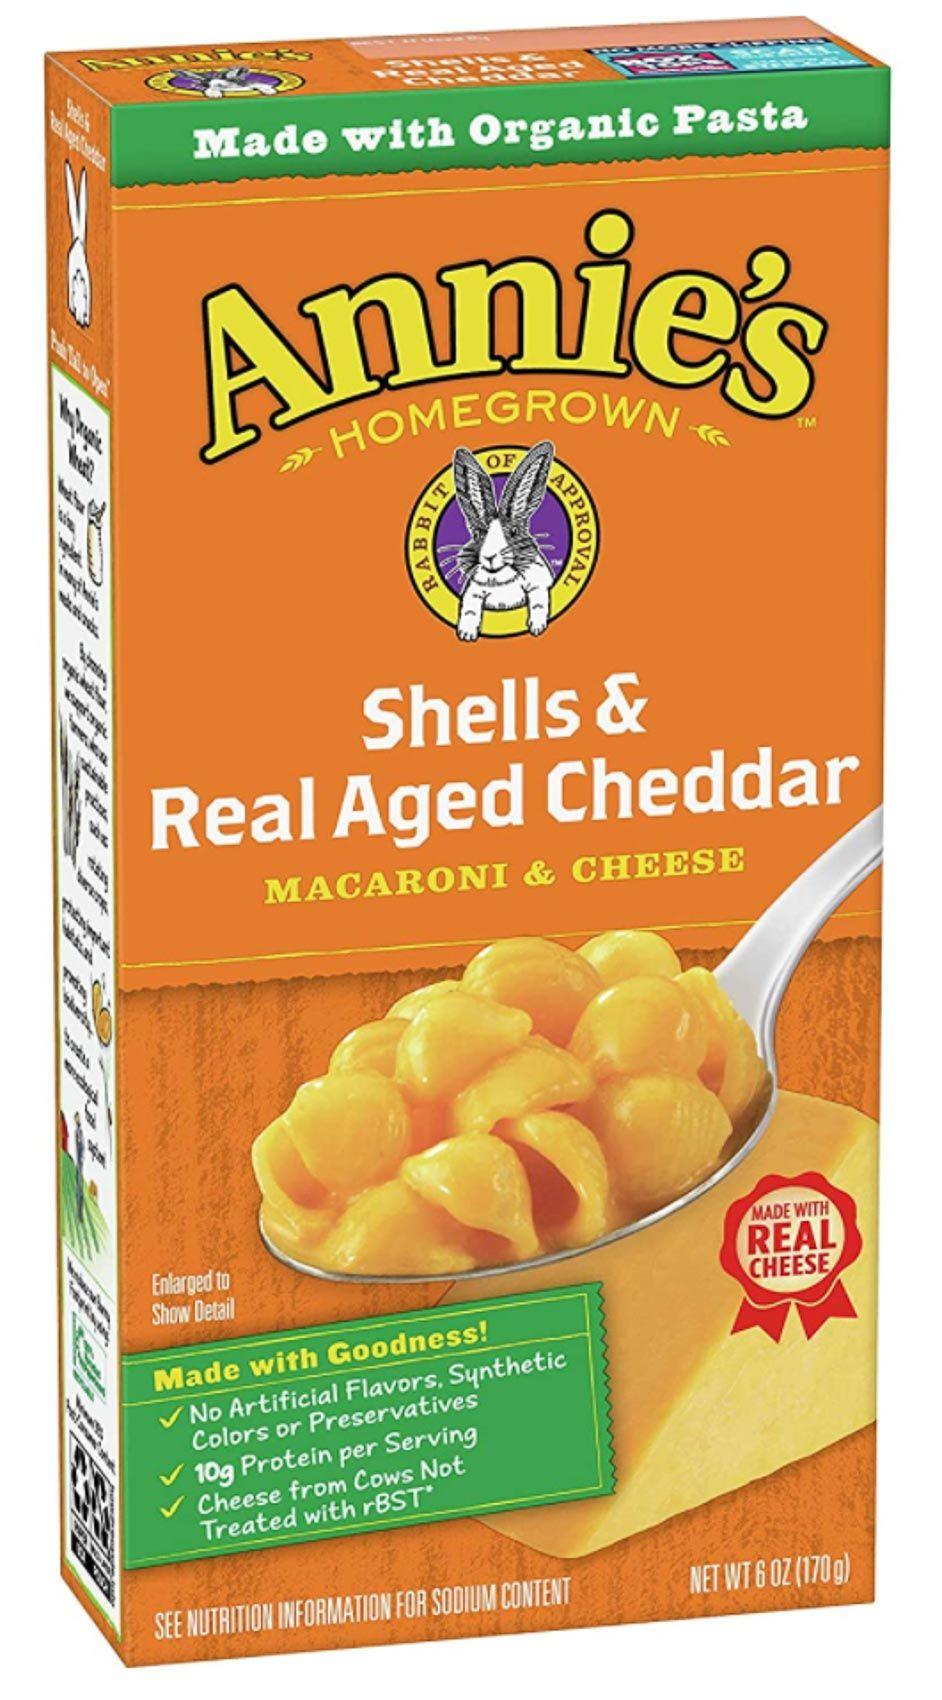 annies_shells_real_aged_cheddar_macaroni_cheese.jpg